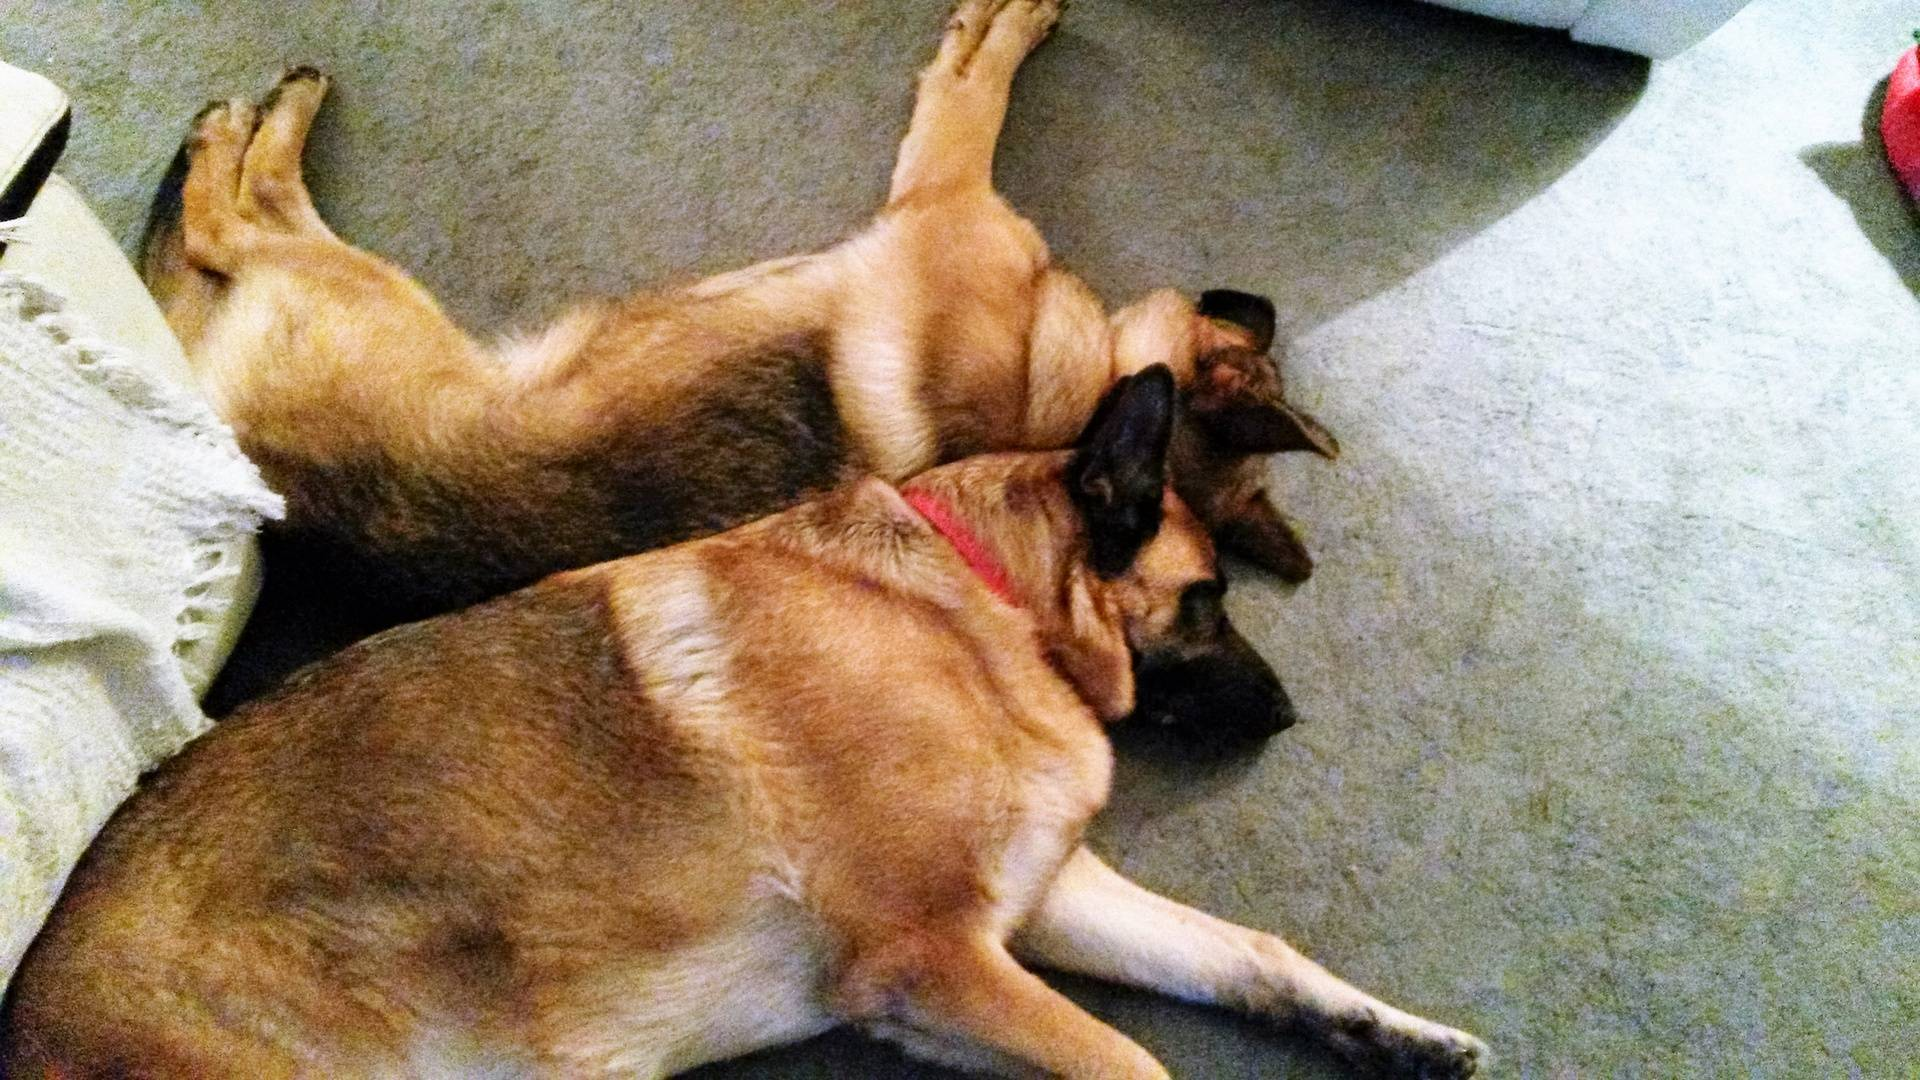 Oscar and Maia